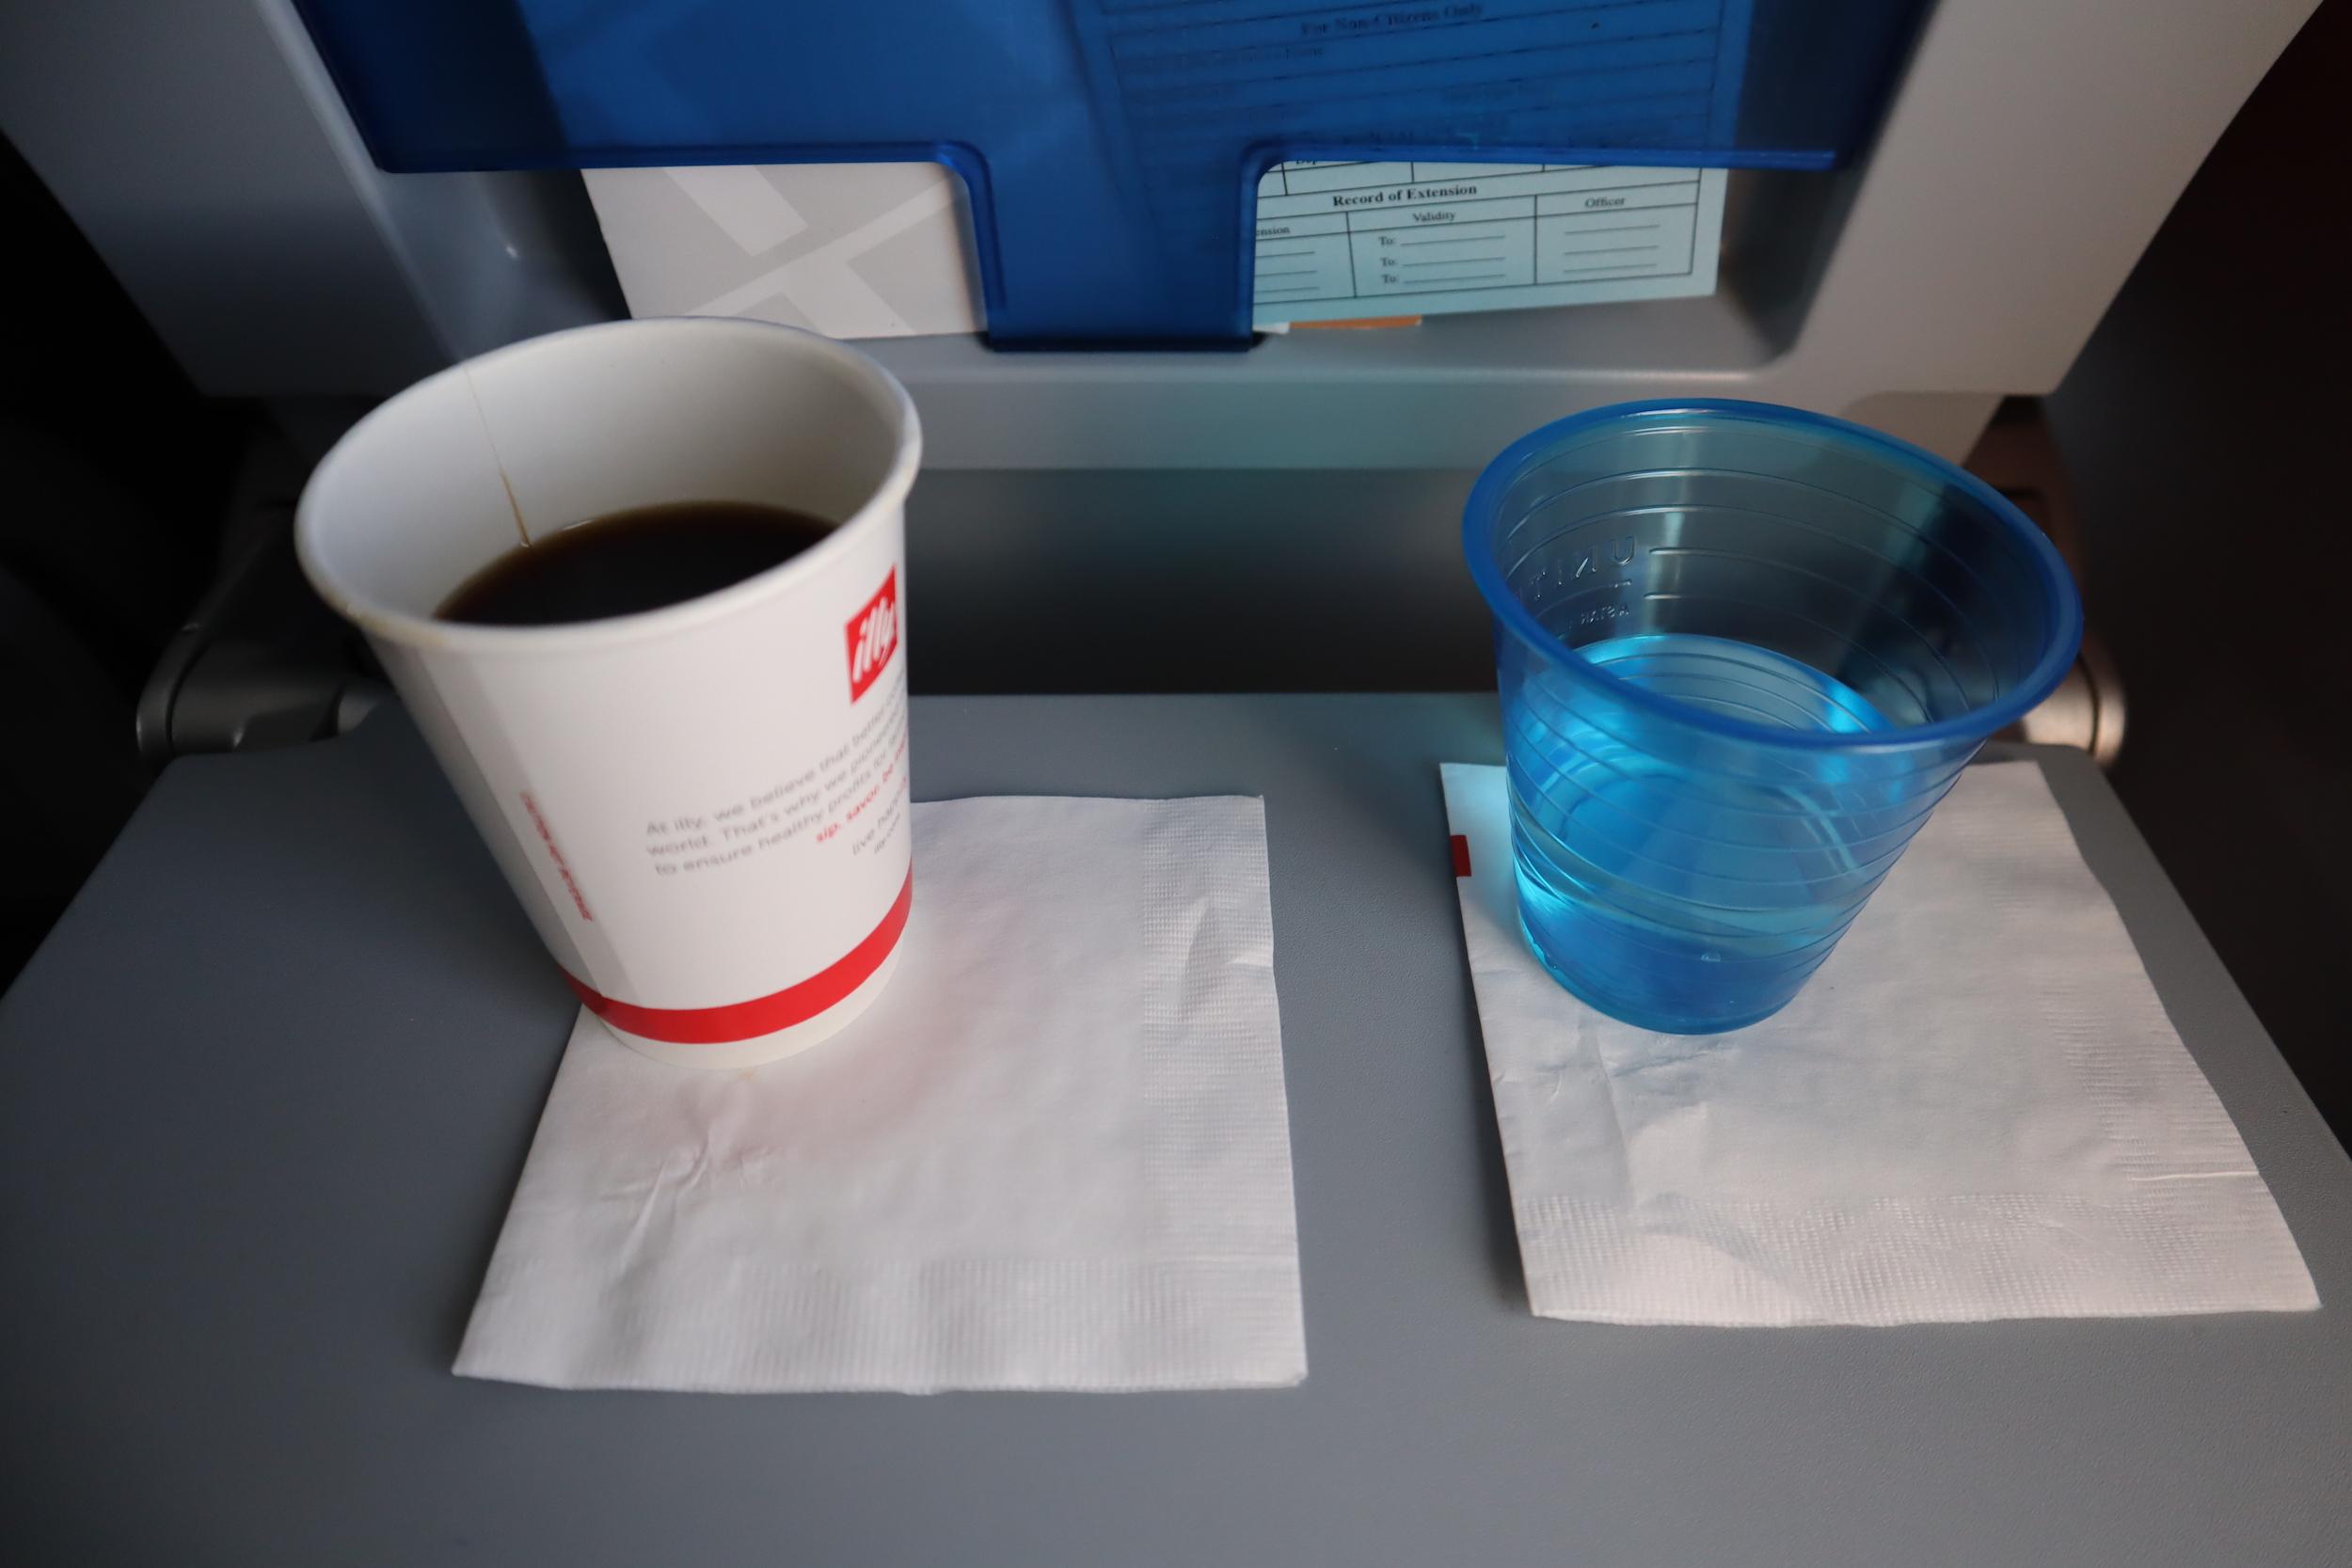 United 737 economy class – Drink service